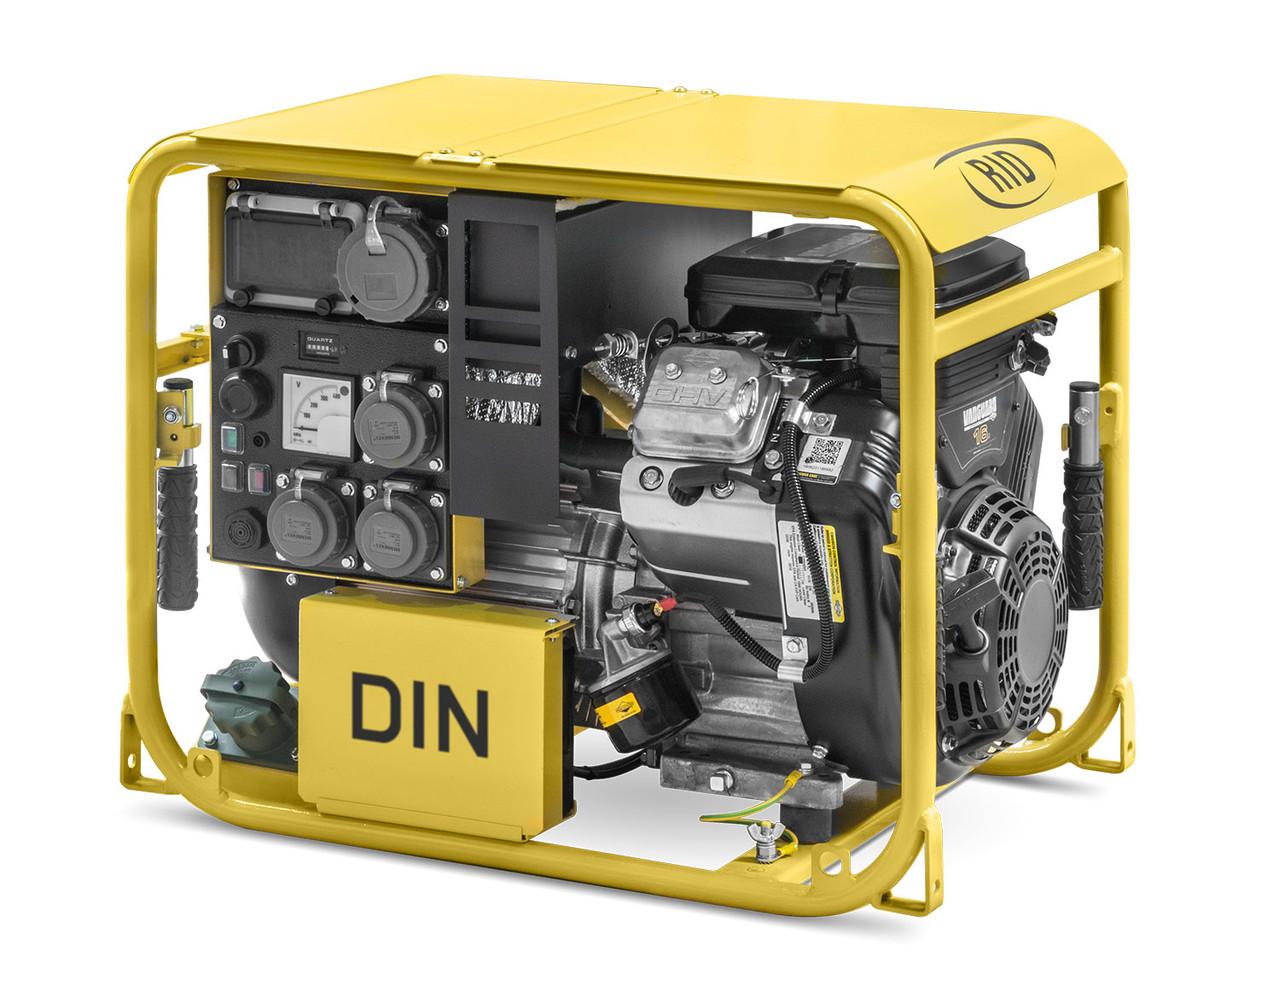 DIN RID RV 13540 ERN (10,4 кВт)